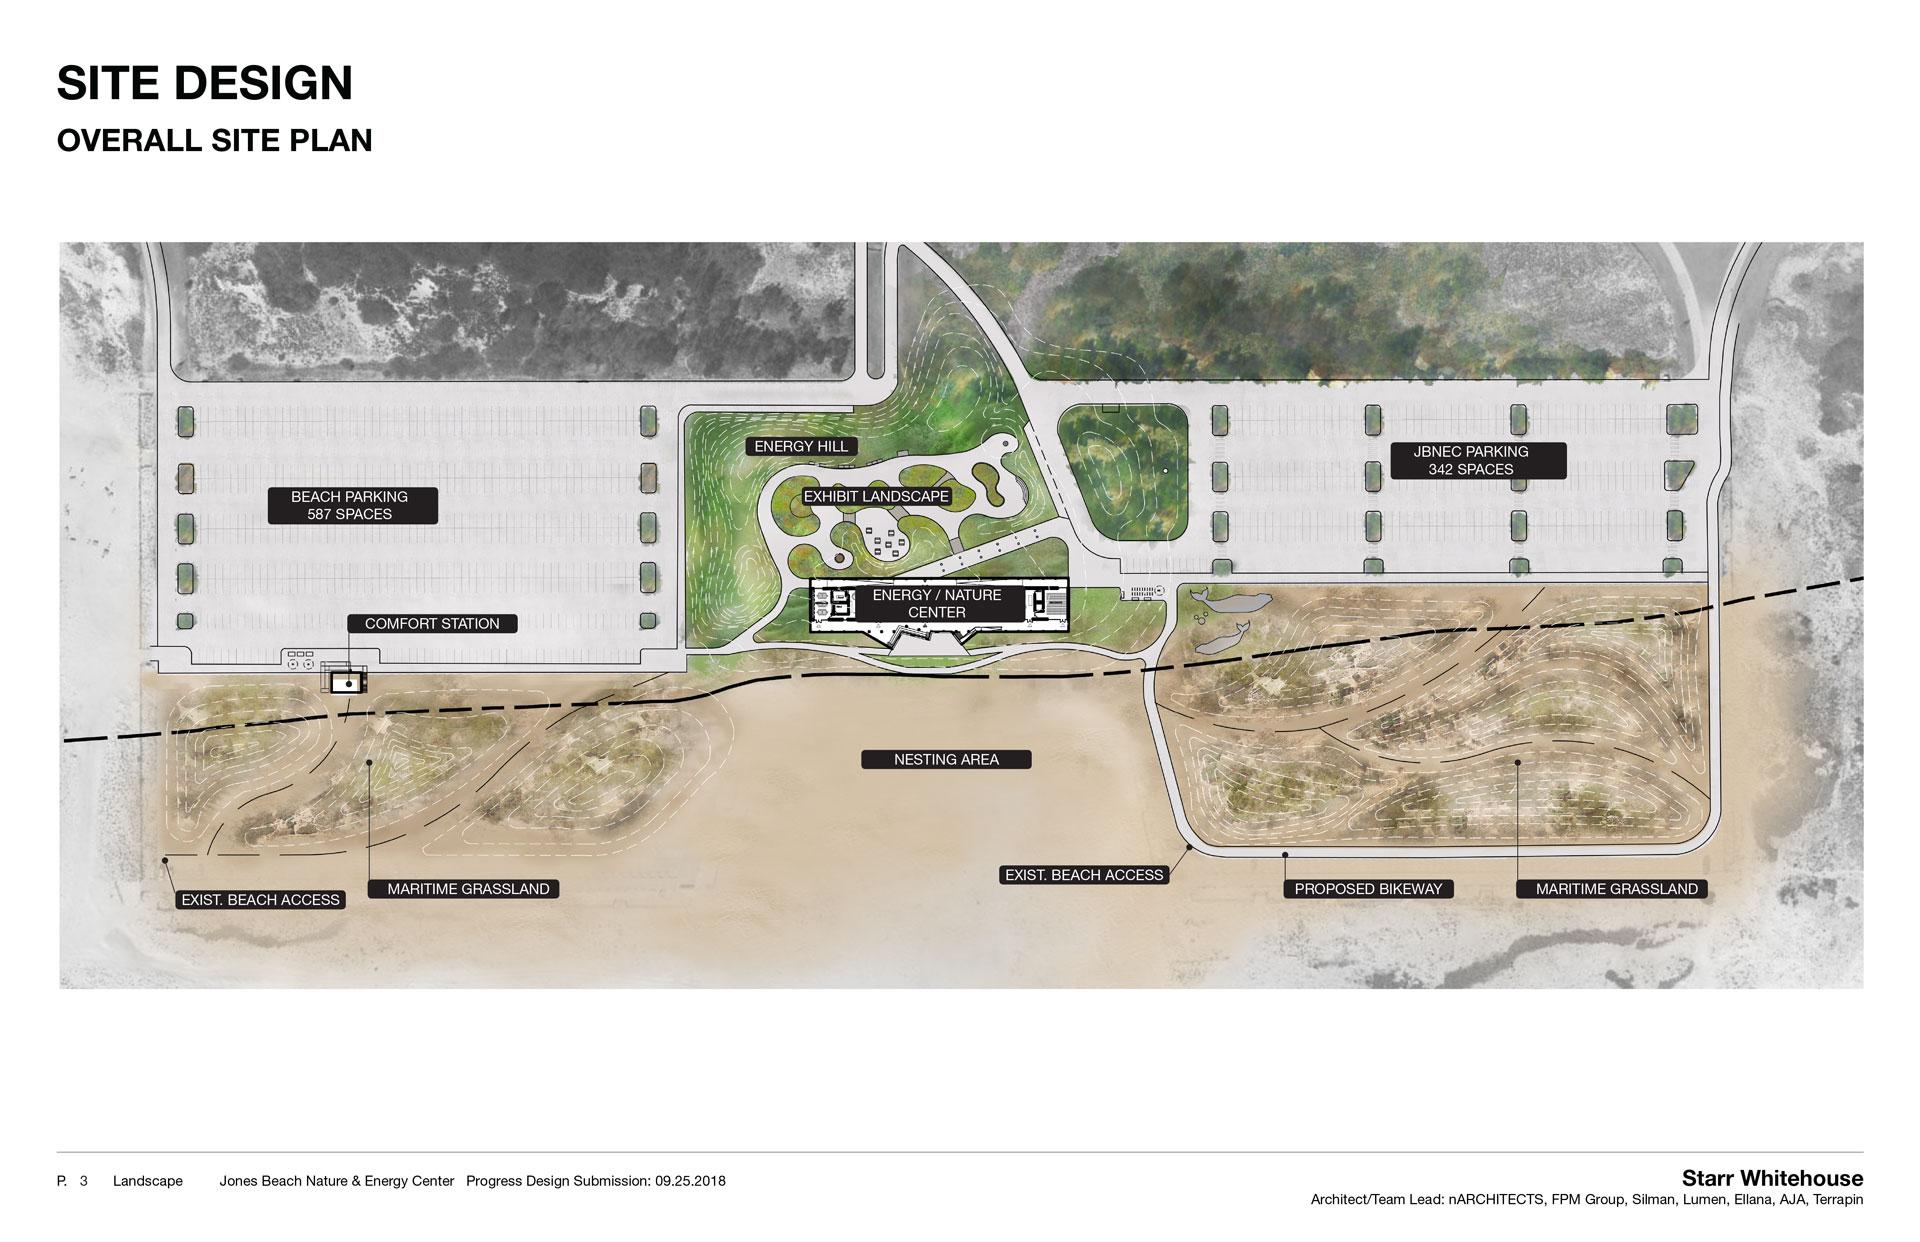 Jones Beach Slide 1